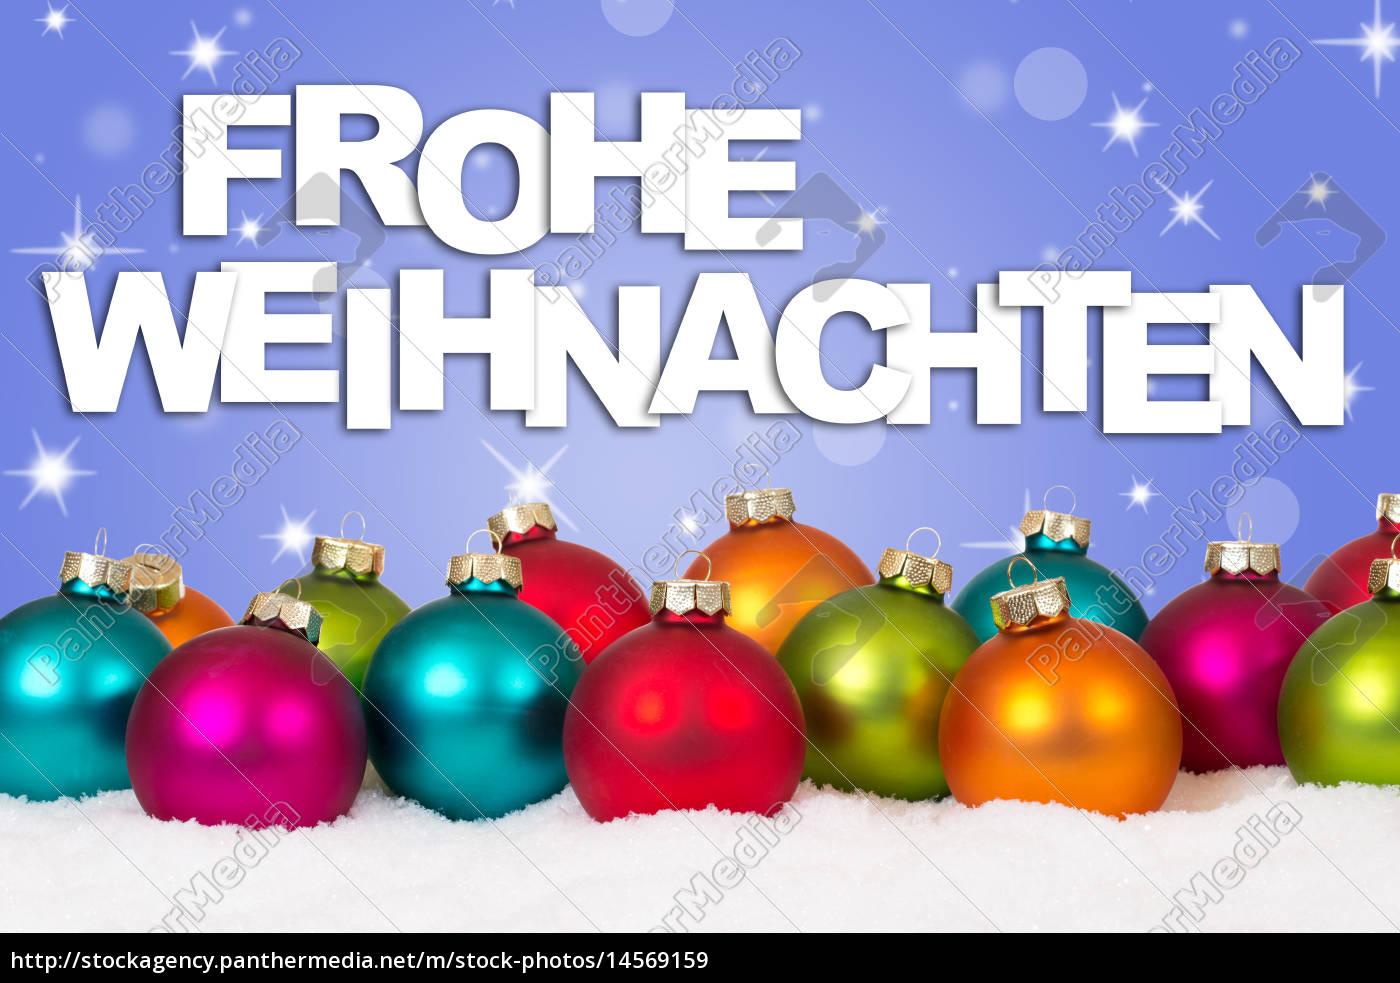 Frohe Weihnachten Hindi.Frohe Weihnachten Hindi